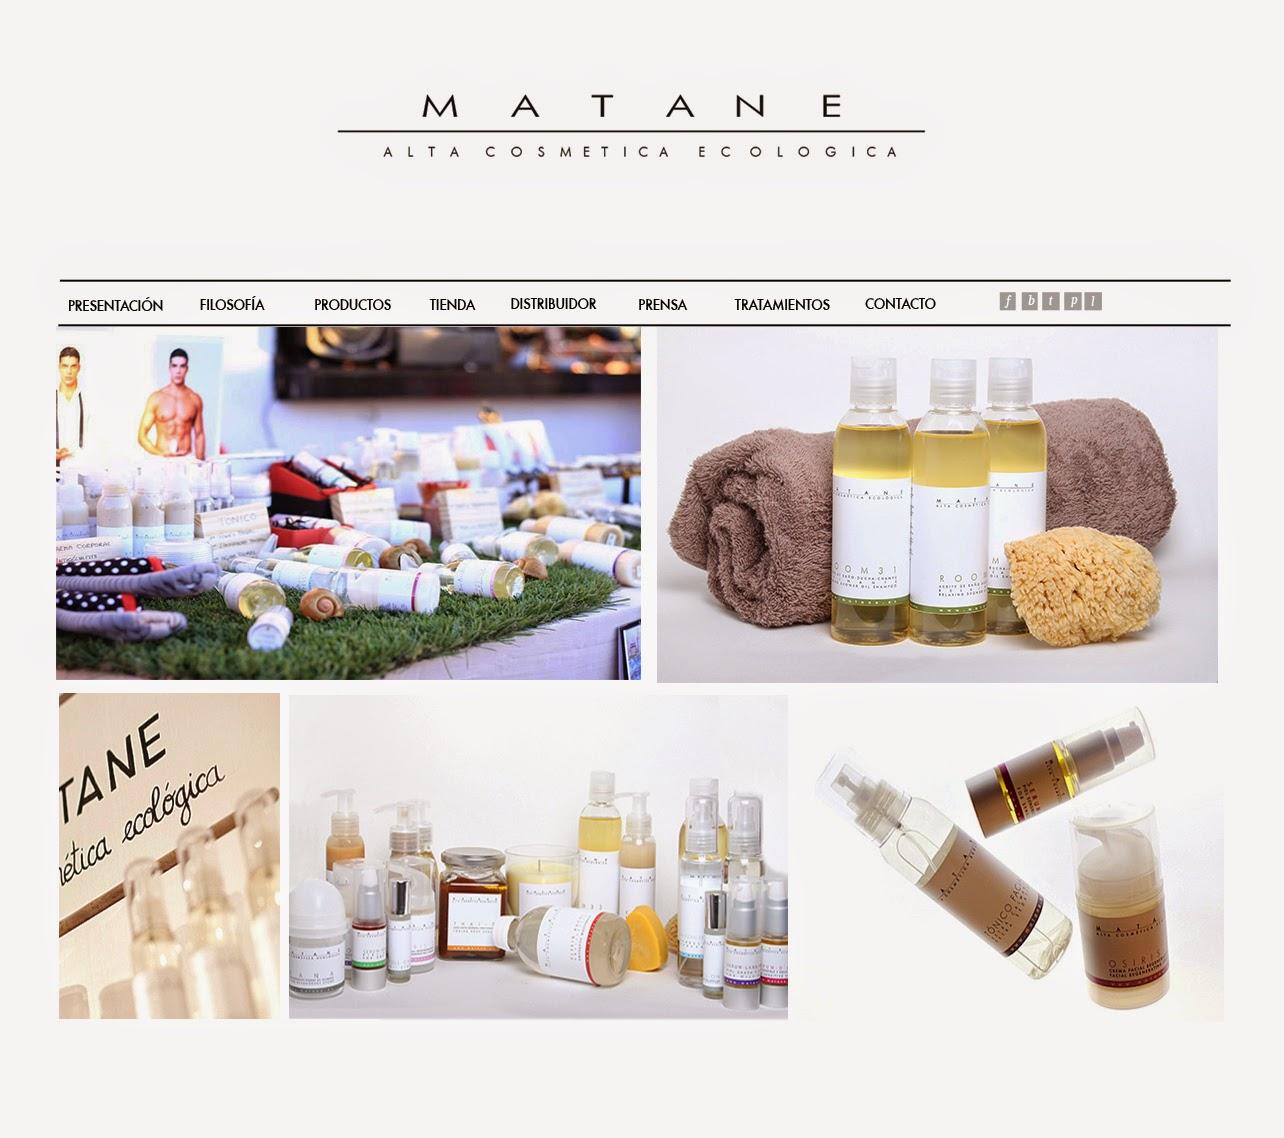 alta cosmética ecológica